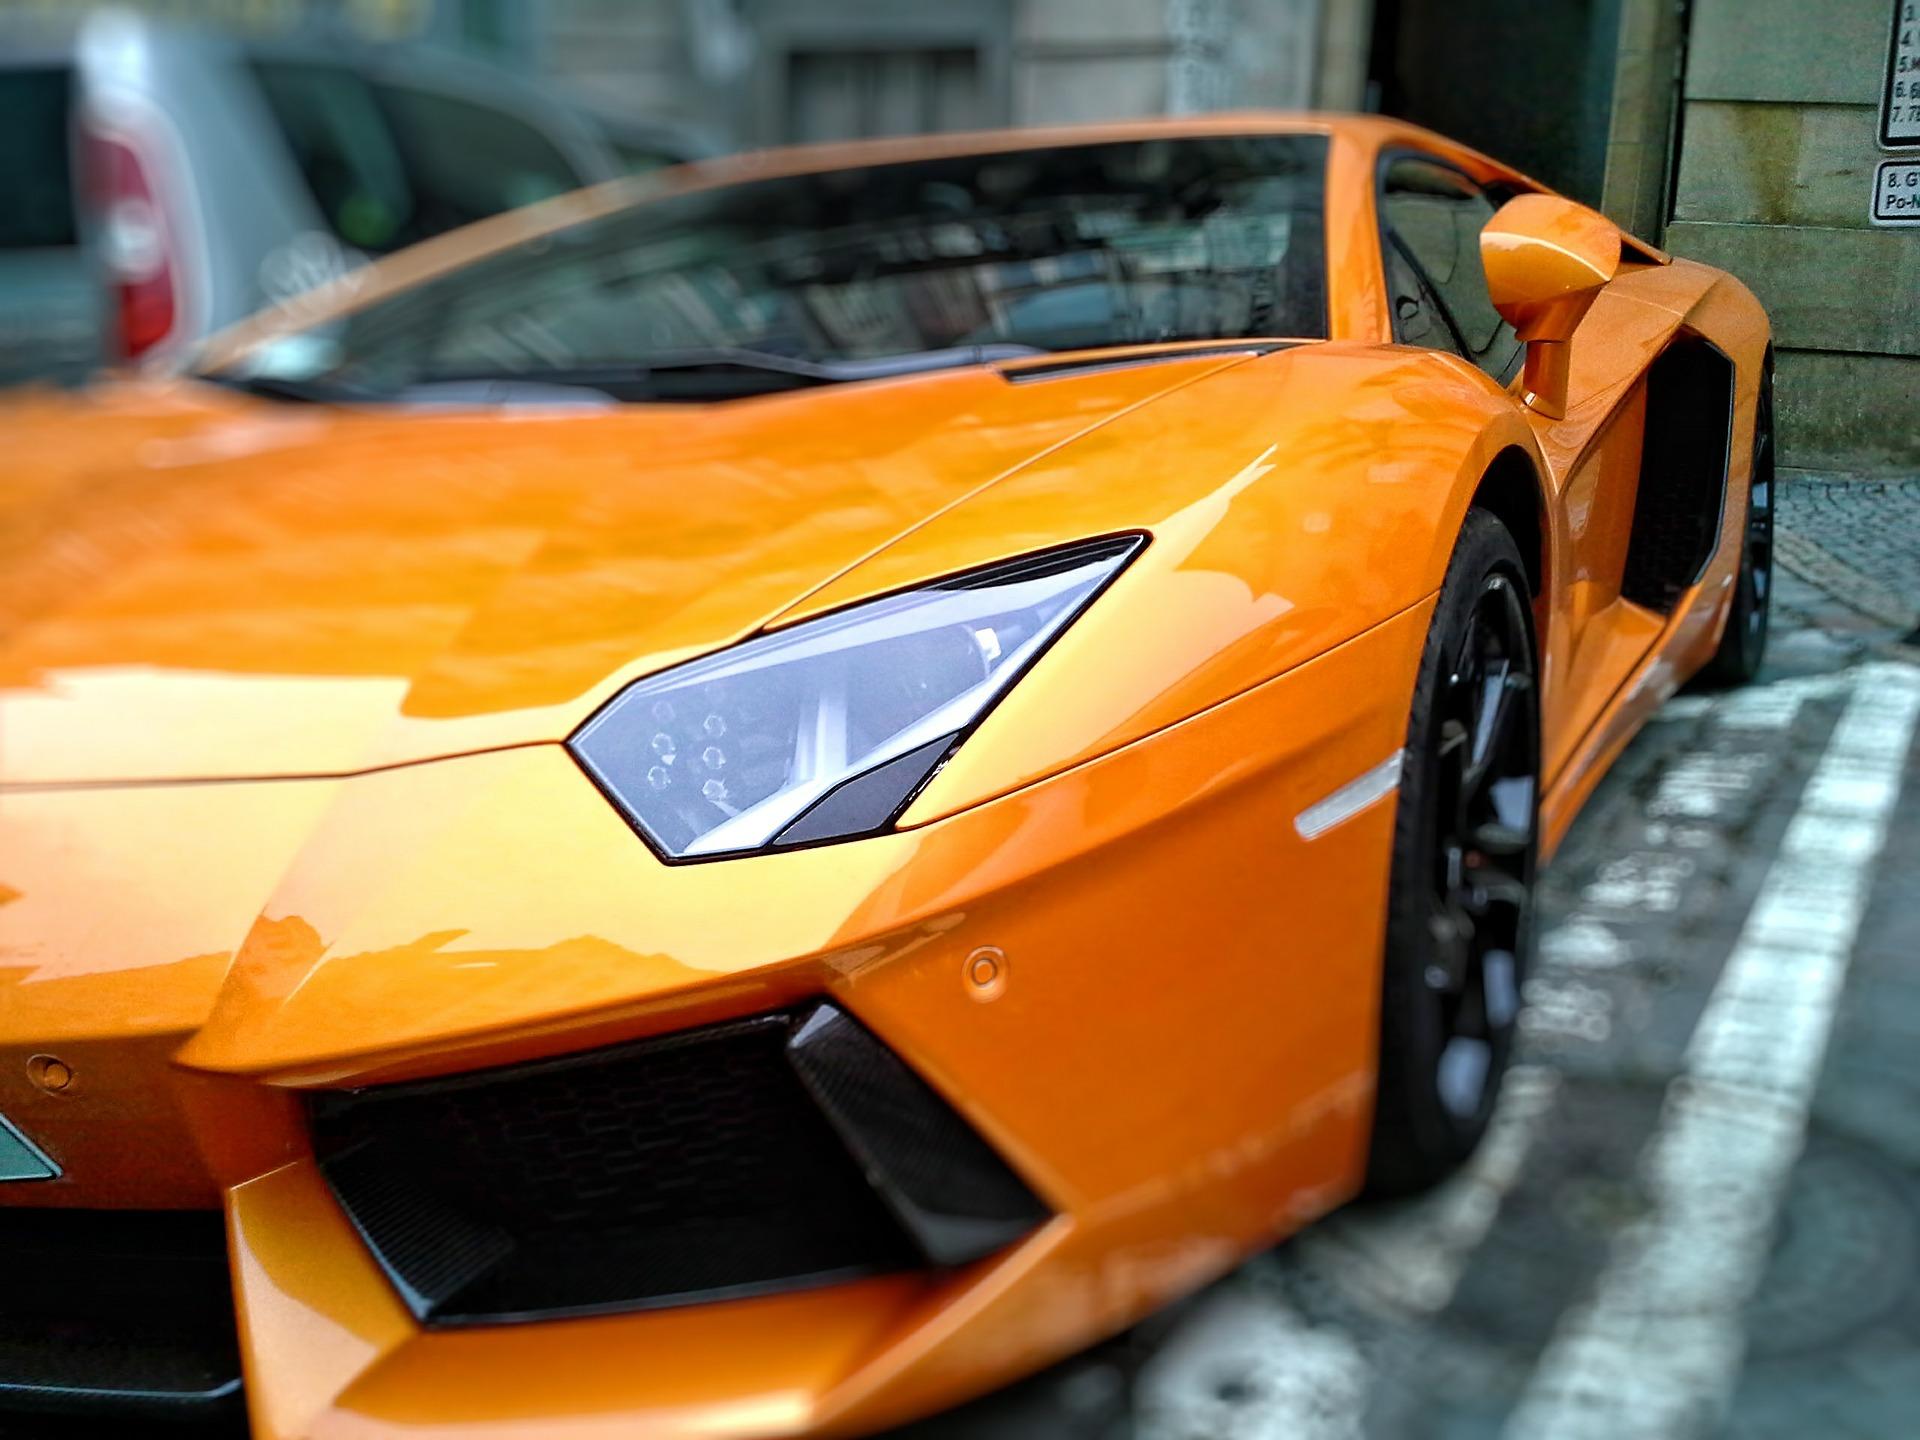 lamborghini cheapest car insurance company